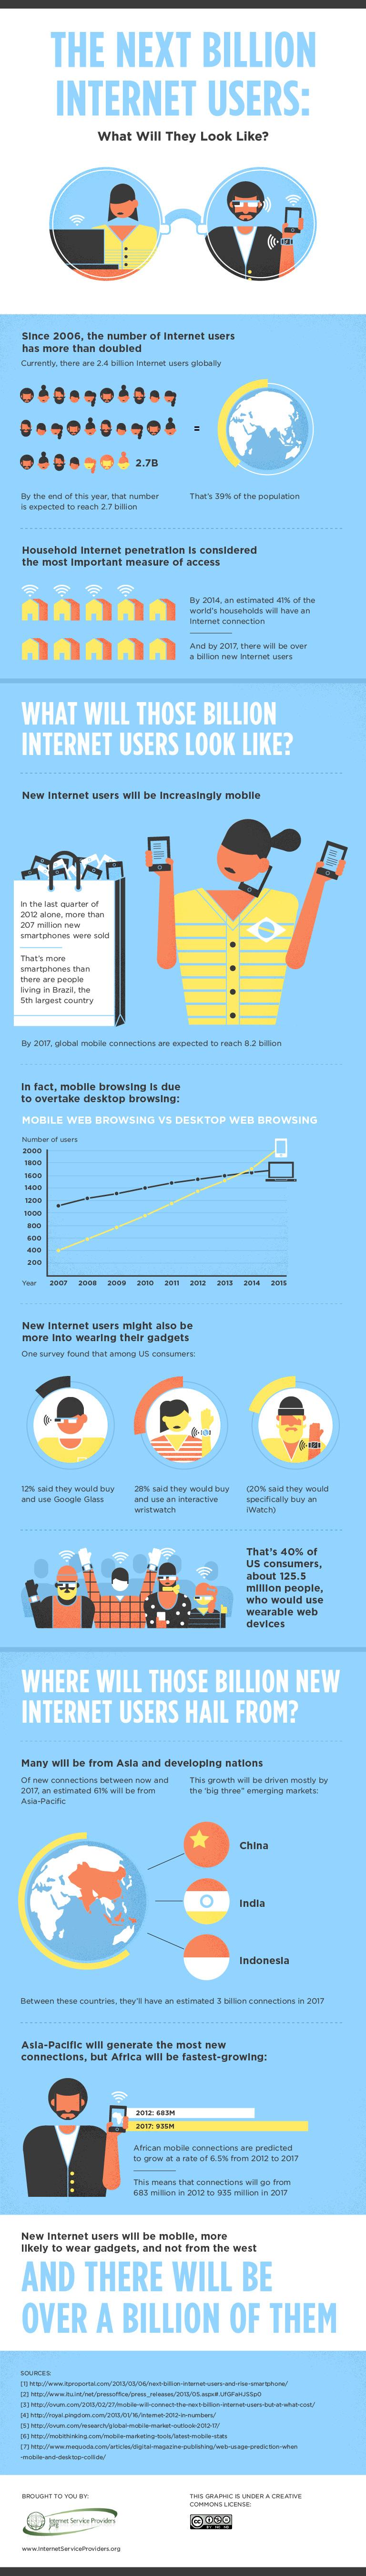 next-billion-internet-users-infographic